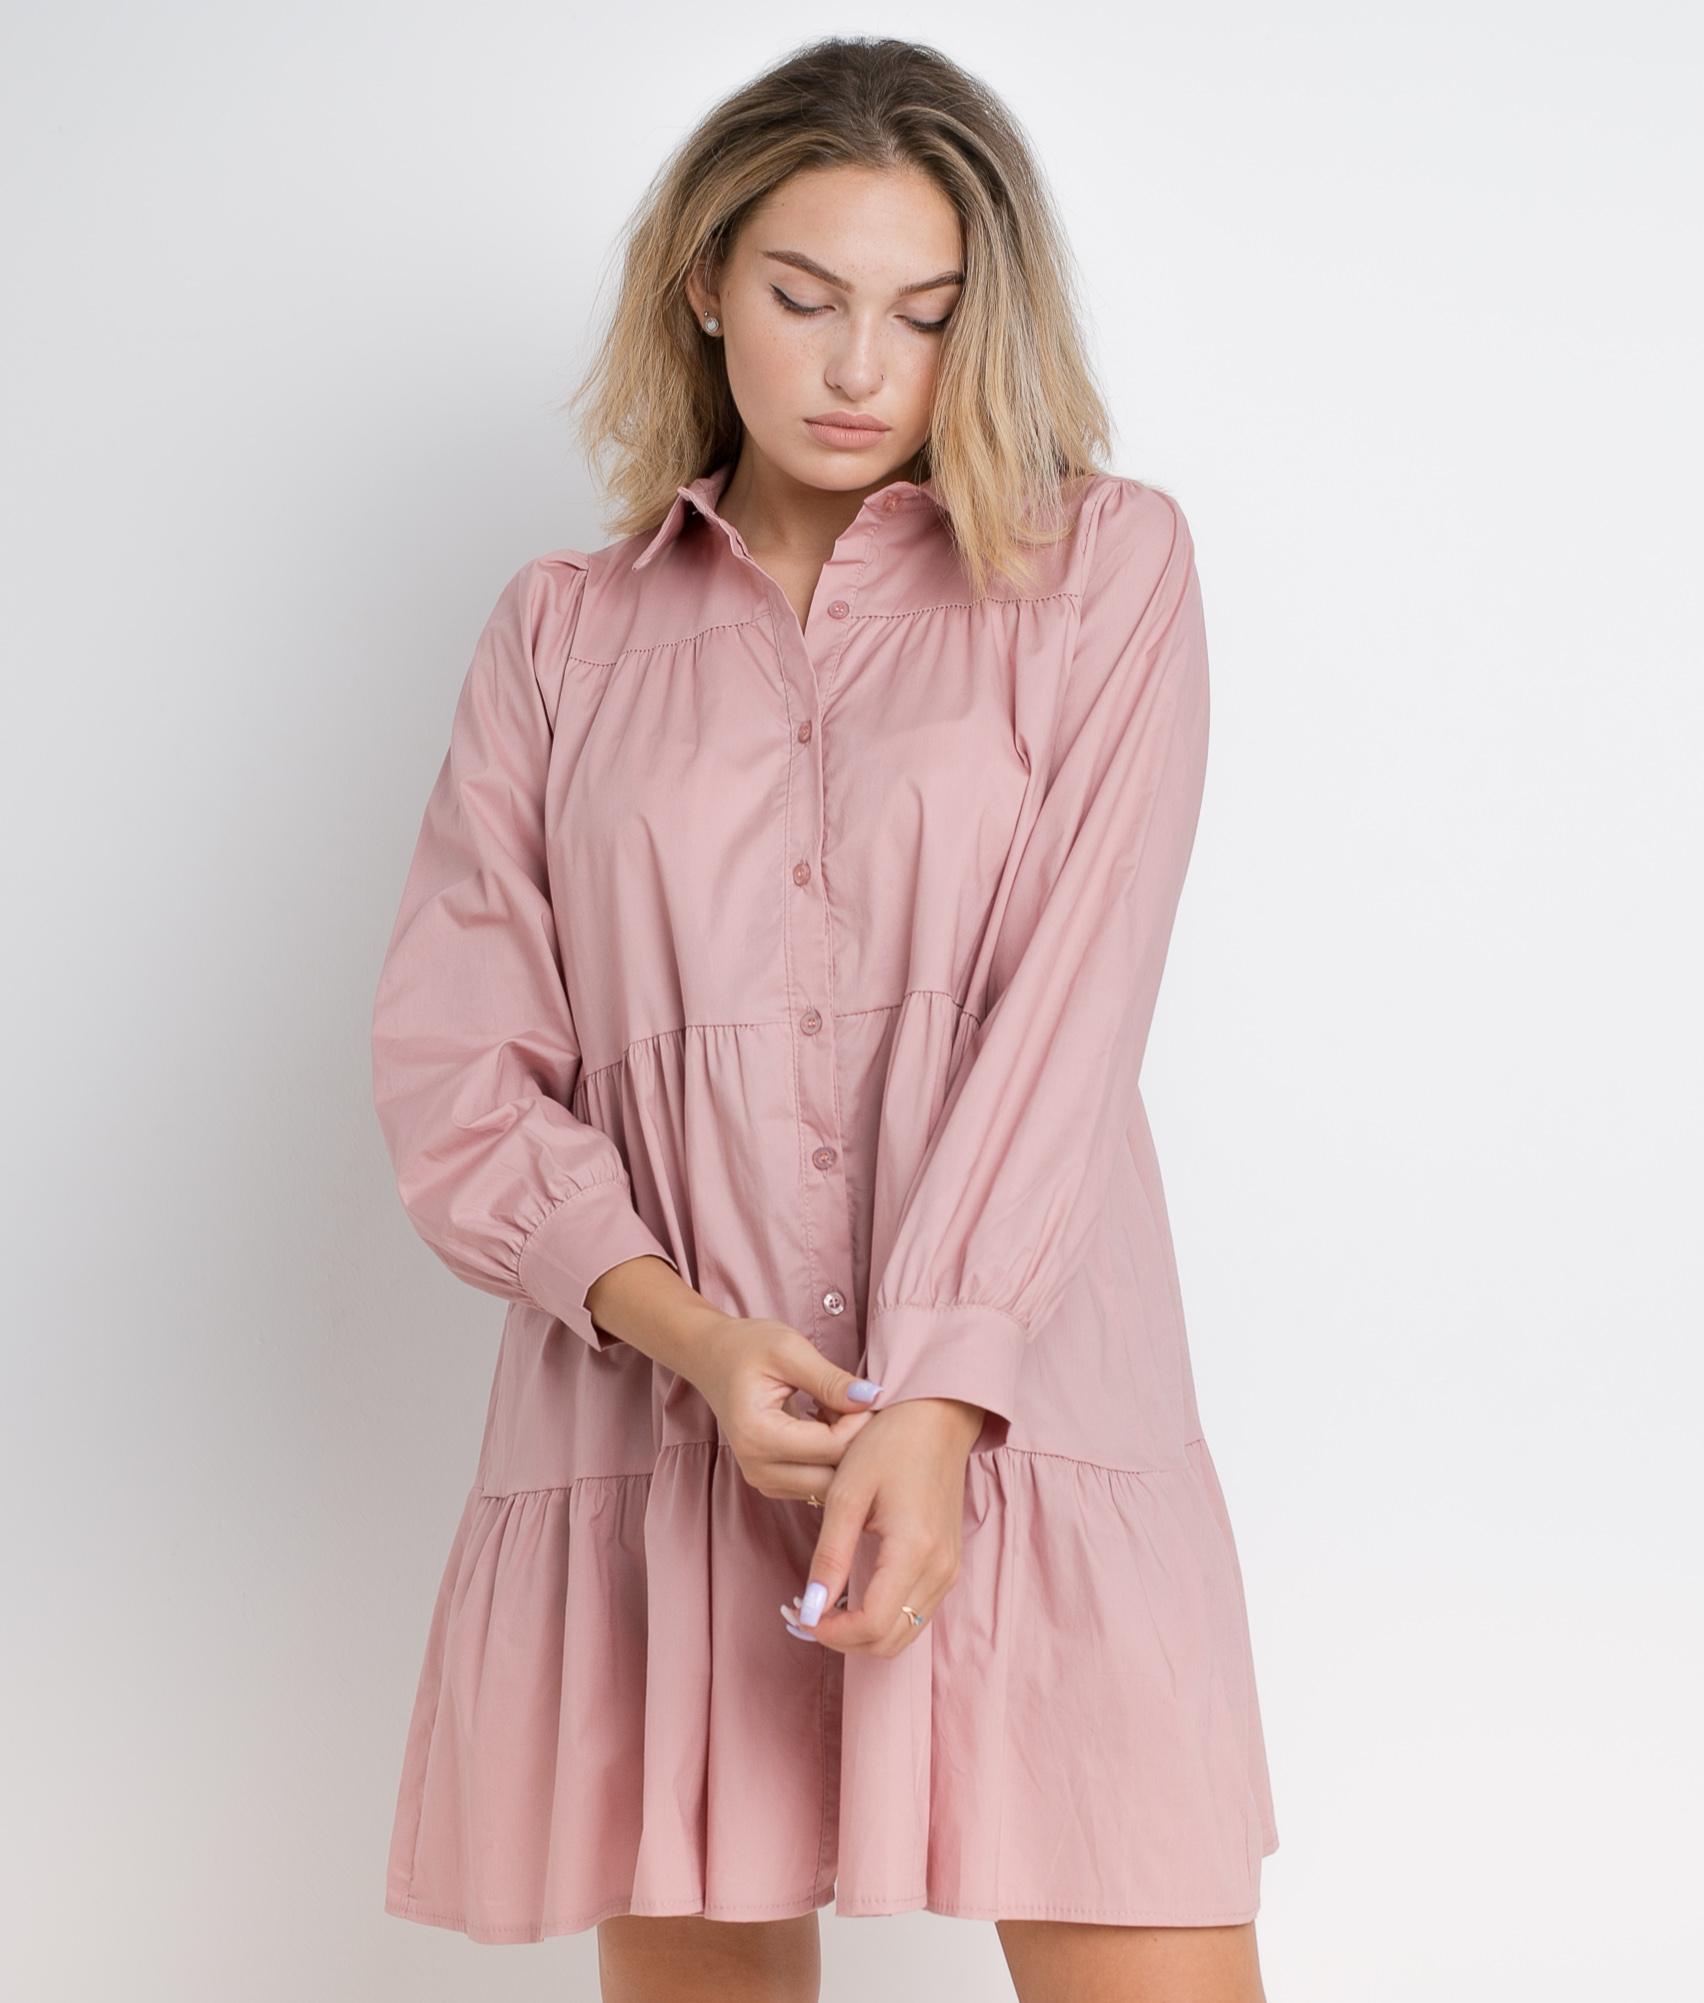 ARCONA DRESS - PINK